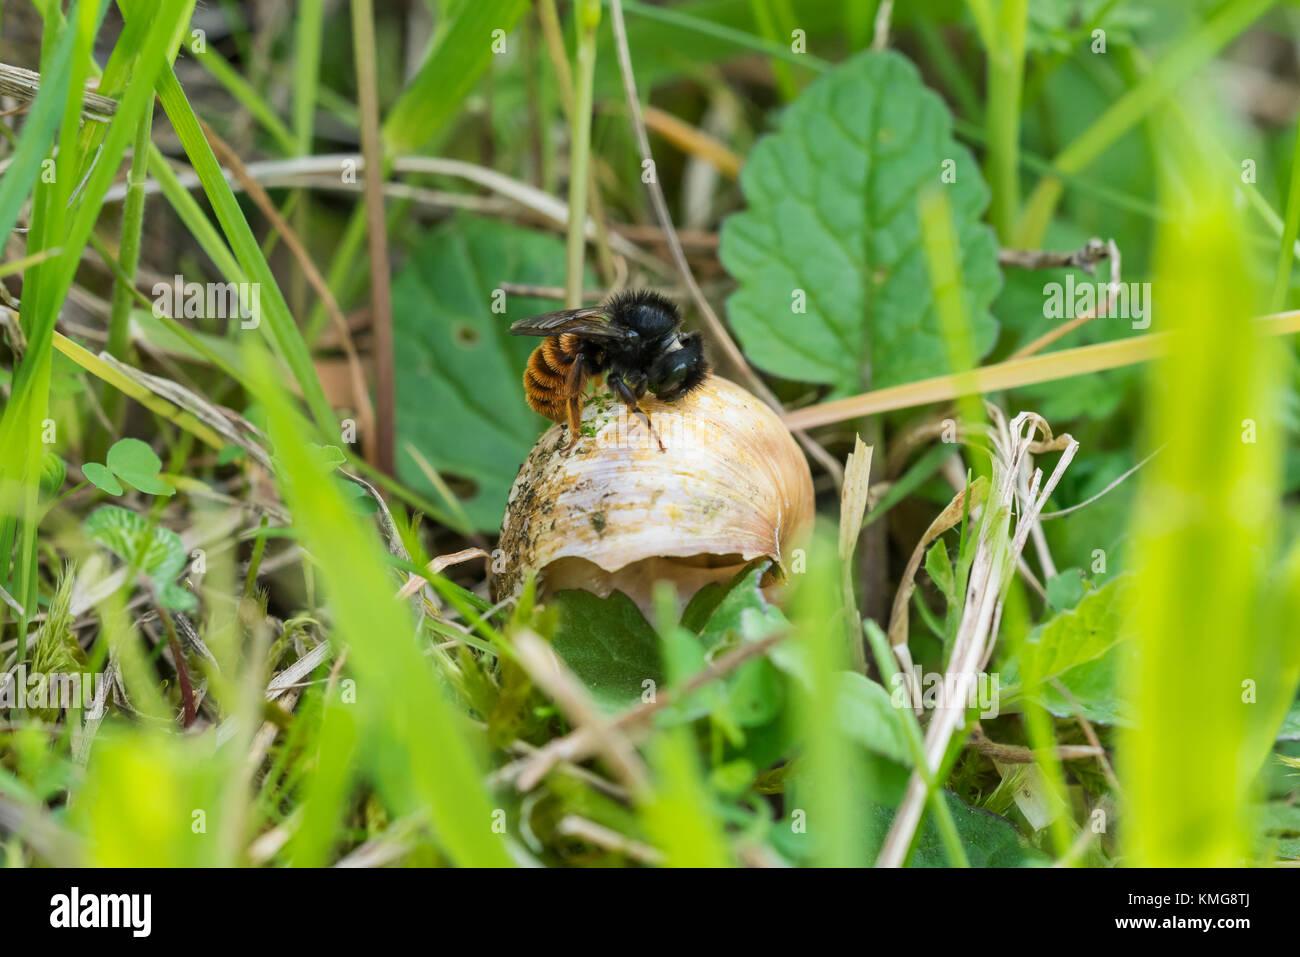 Zweifarbige Schneckenhaus Mauerbiene, Osmia bicolor, red-tailed mason bee - Stock Image